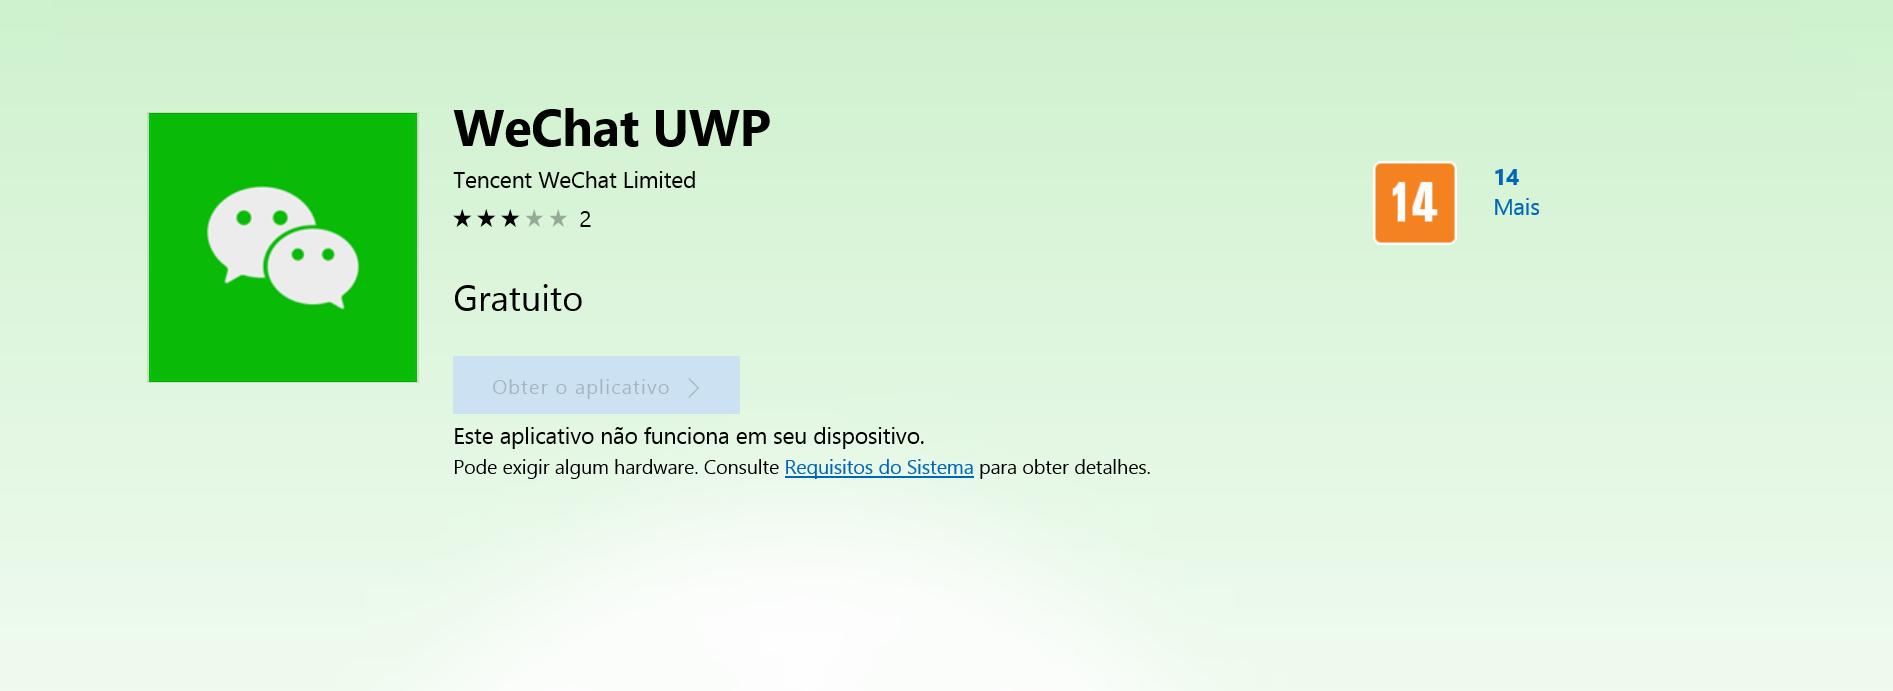 We Chat apresenta o We Chat UWP